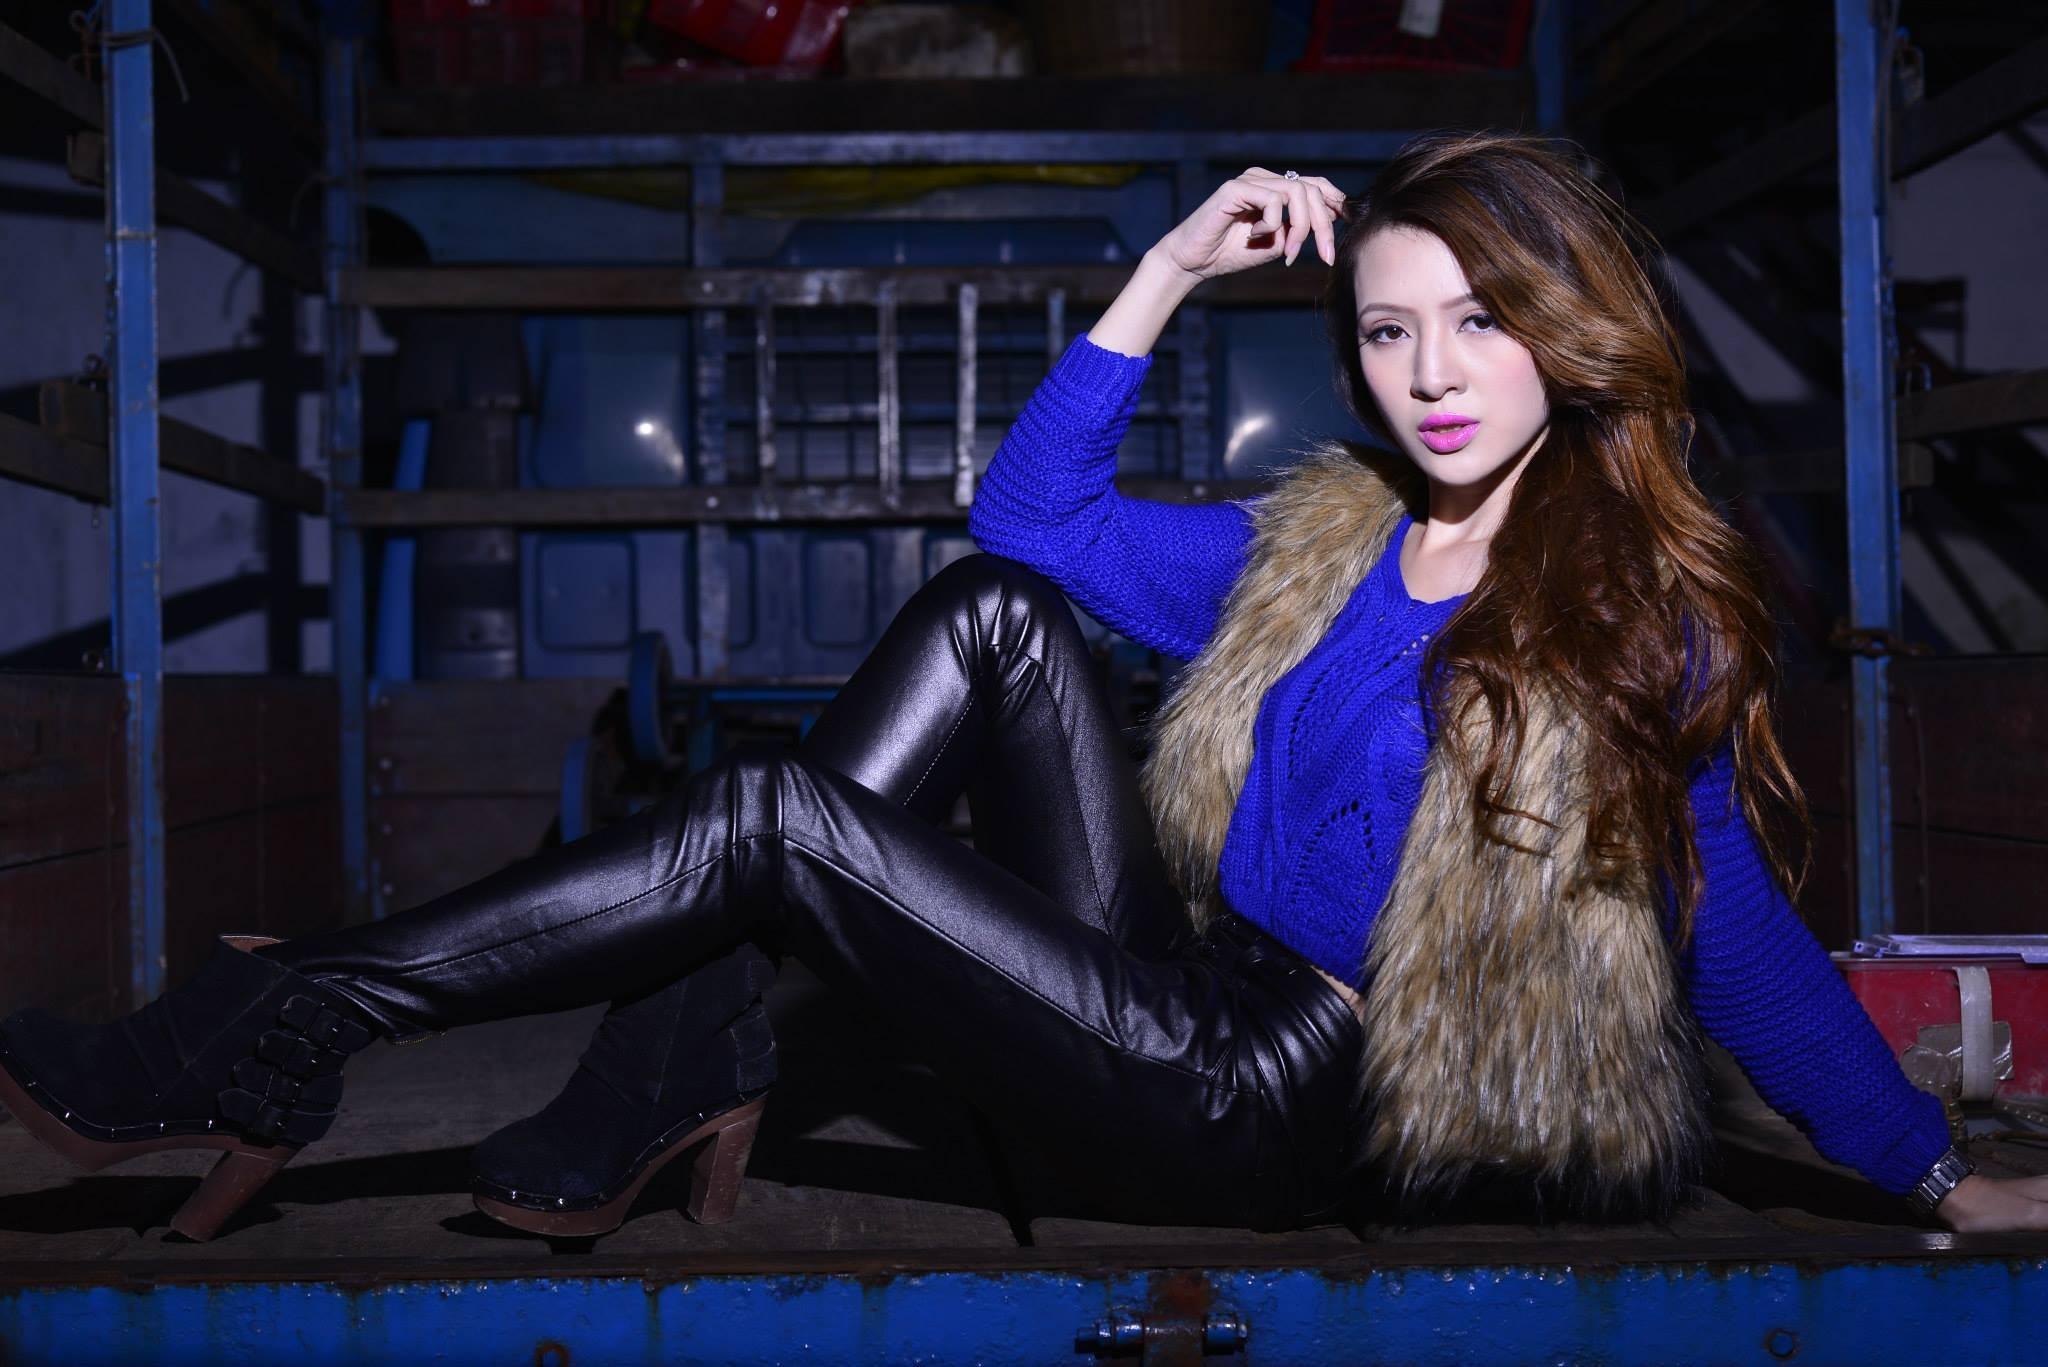 People 2048x1367 brunette Asian women long hair blue sweater leather pants  boots sitting vest